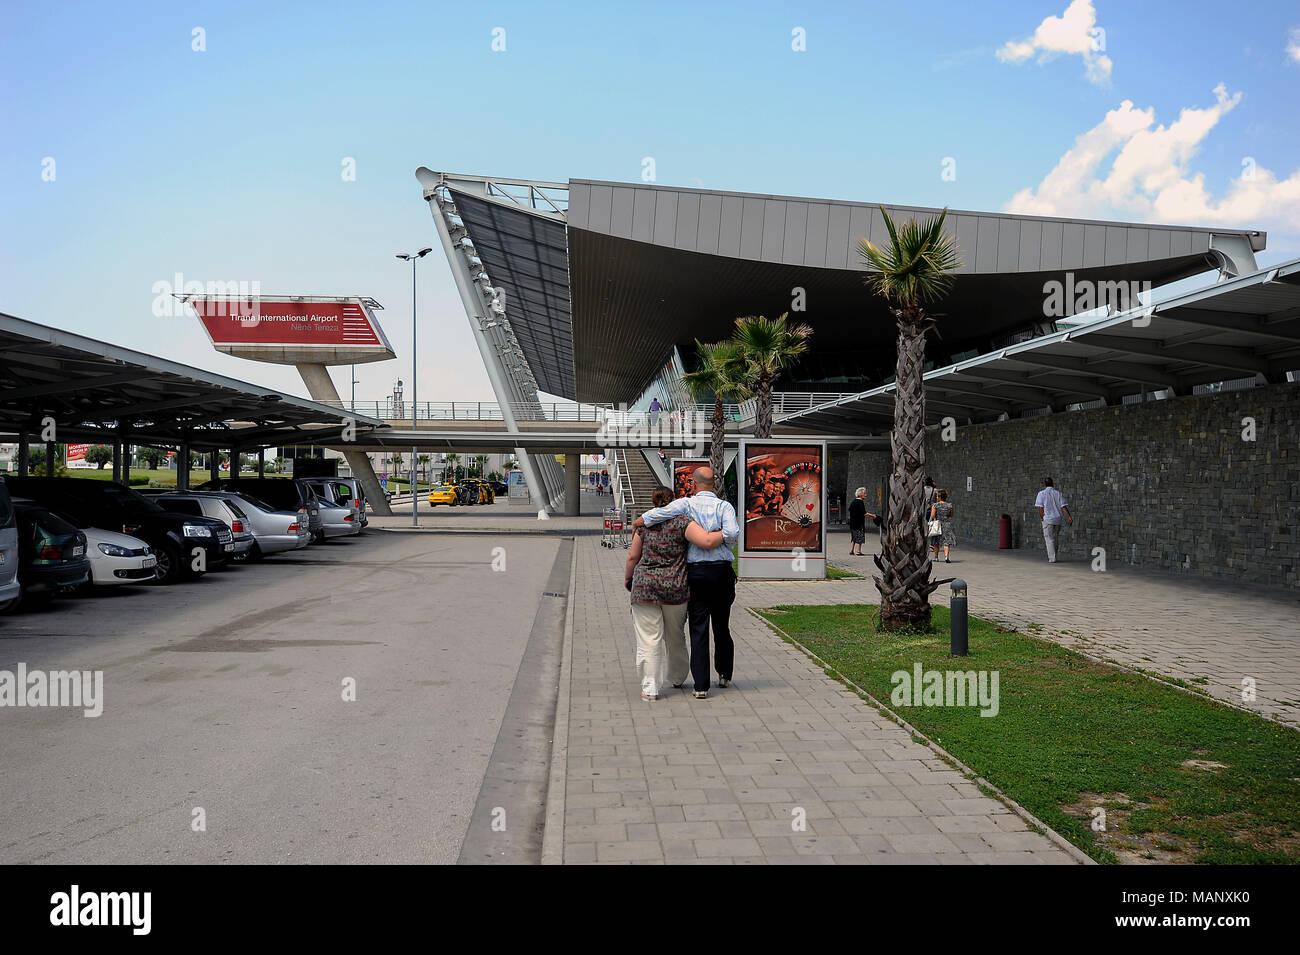 Tirana, Albania, people in front of Tirana Airport - Stock Image